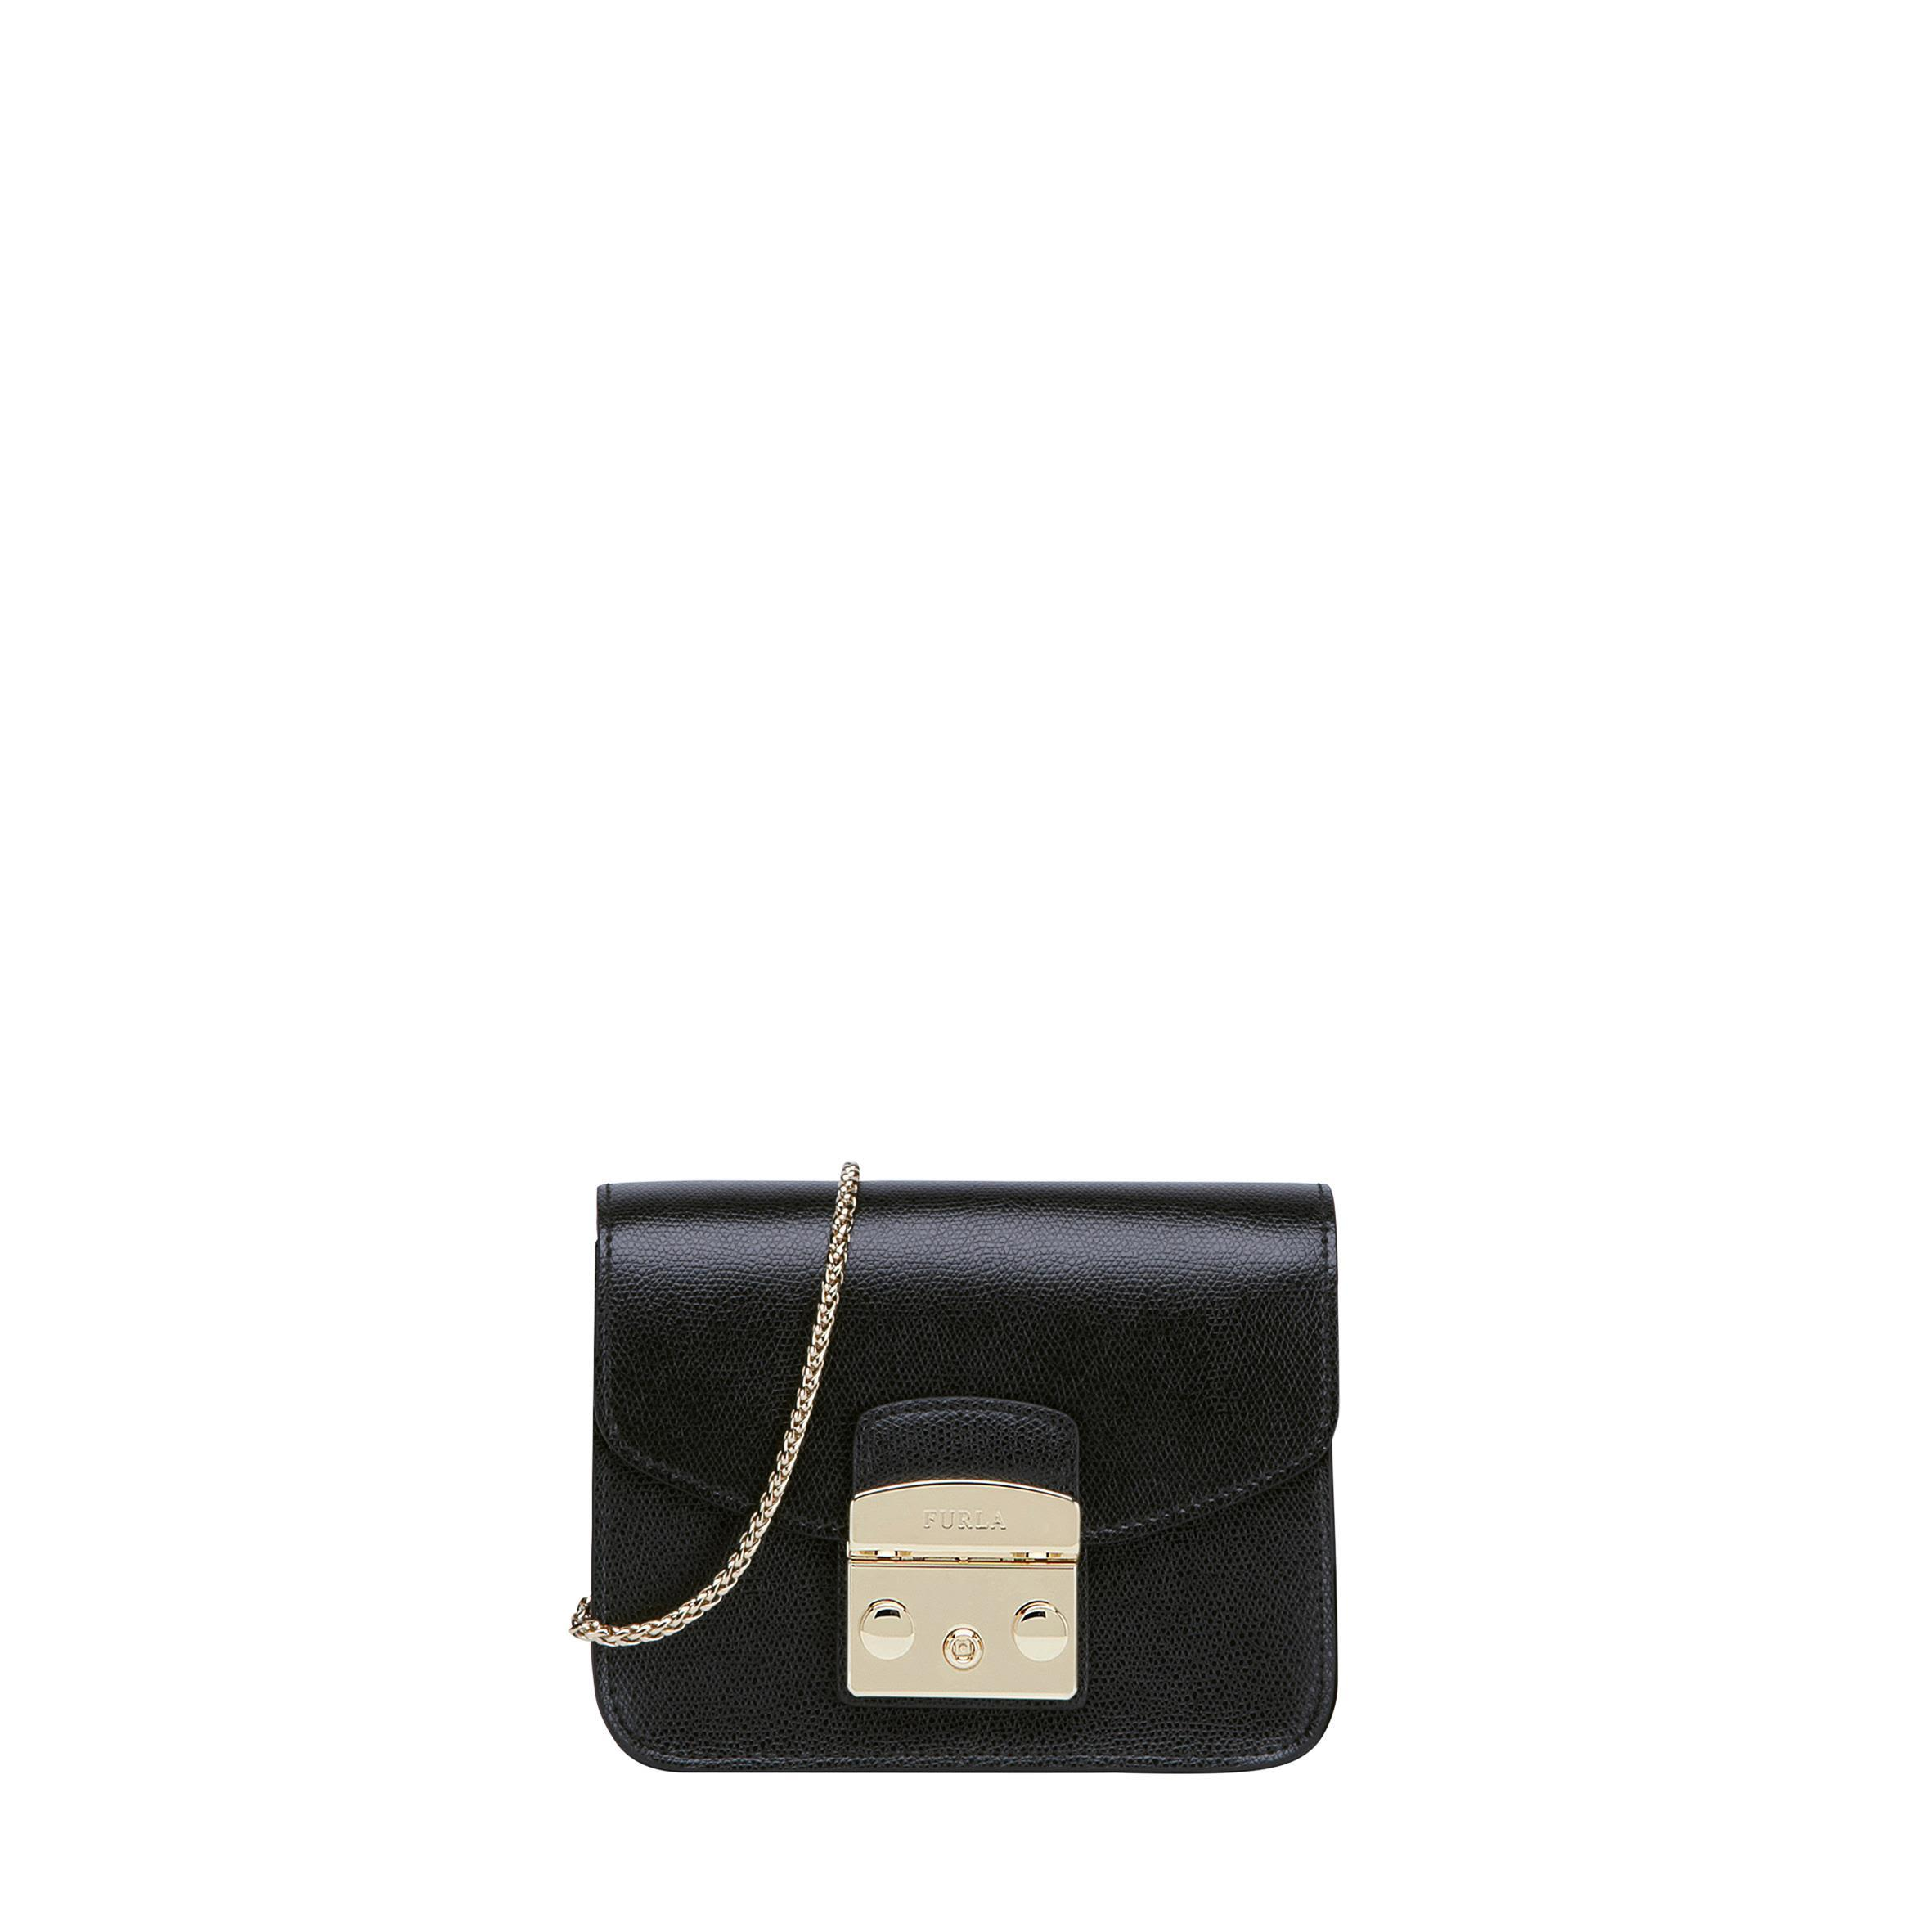 Furla Metropolis Leather Mini Bag In Black